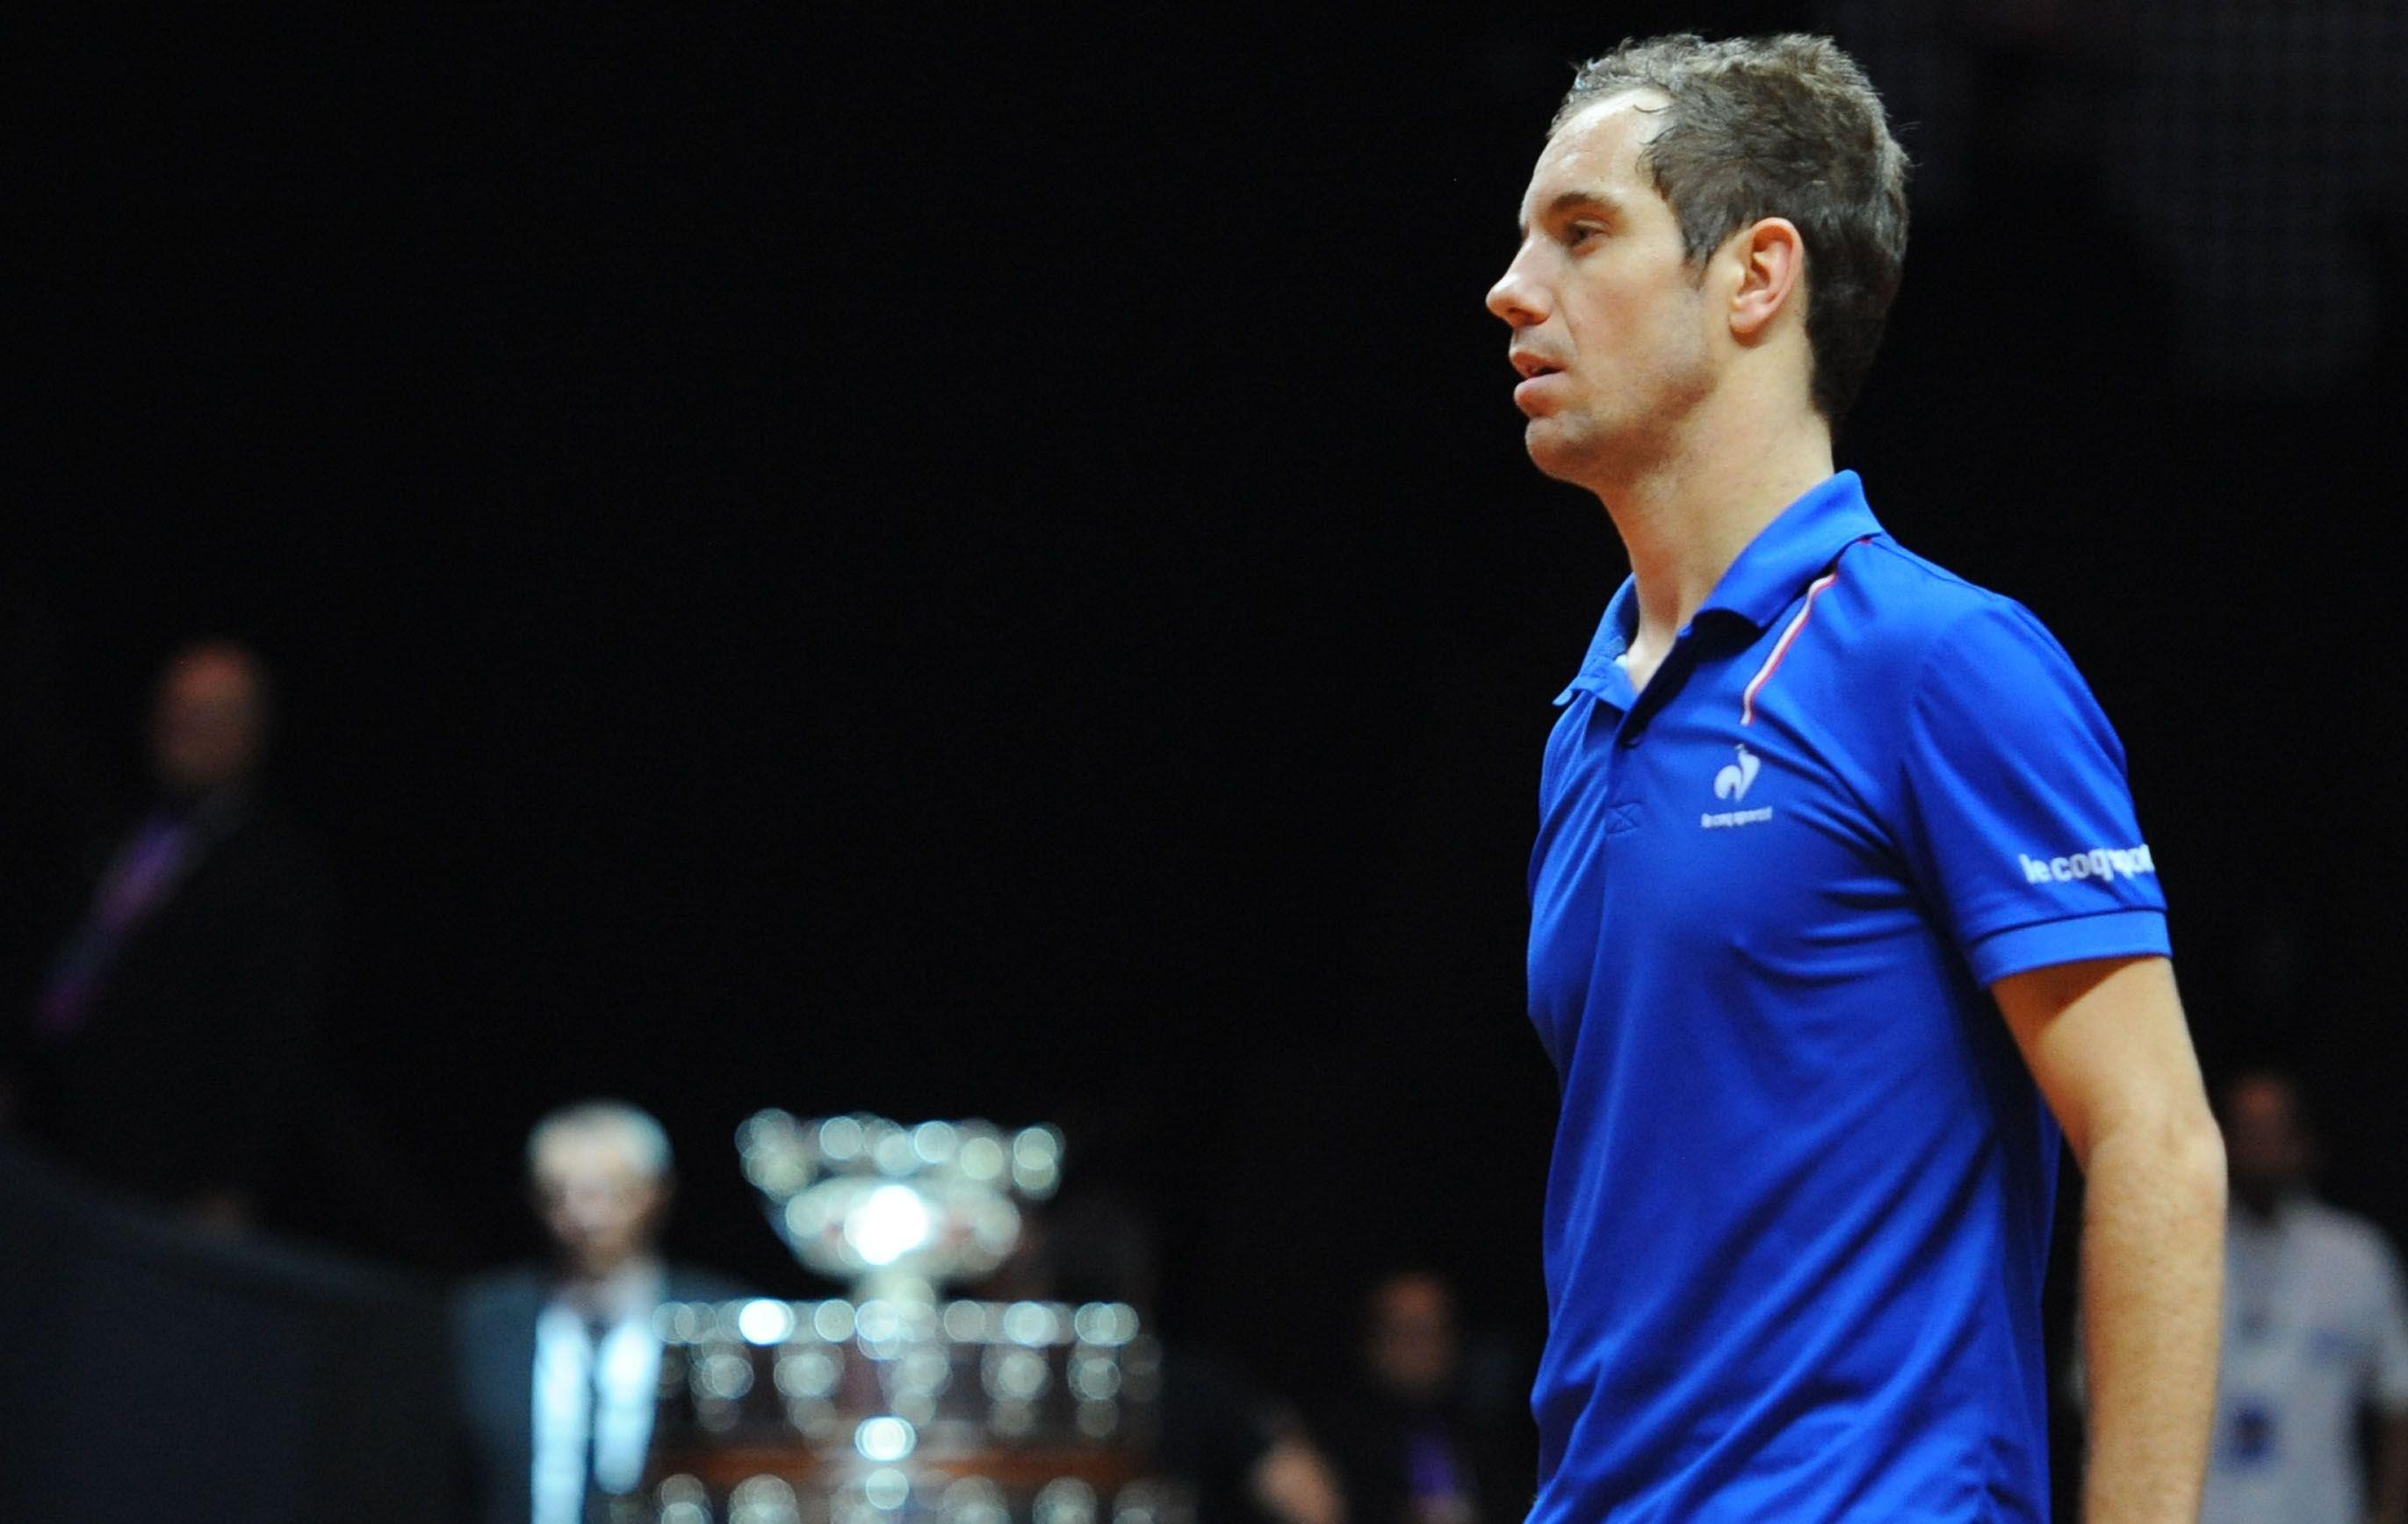 Coupe Davis - Gasquet remplace Tsonga pour affronter Federer